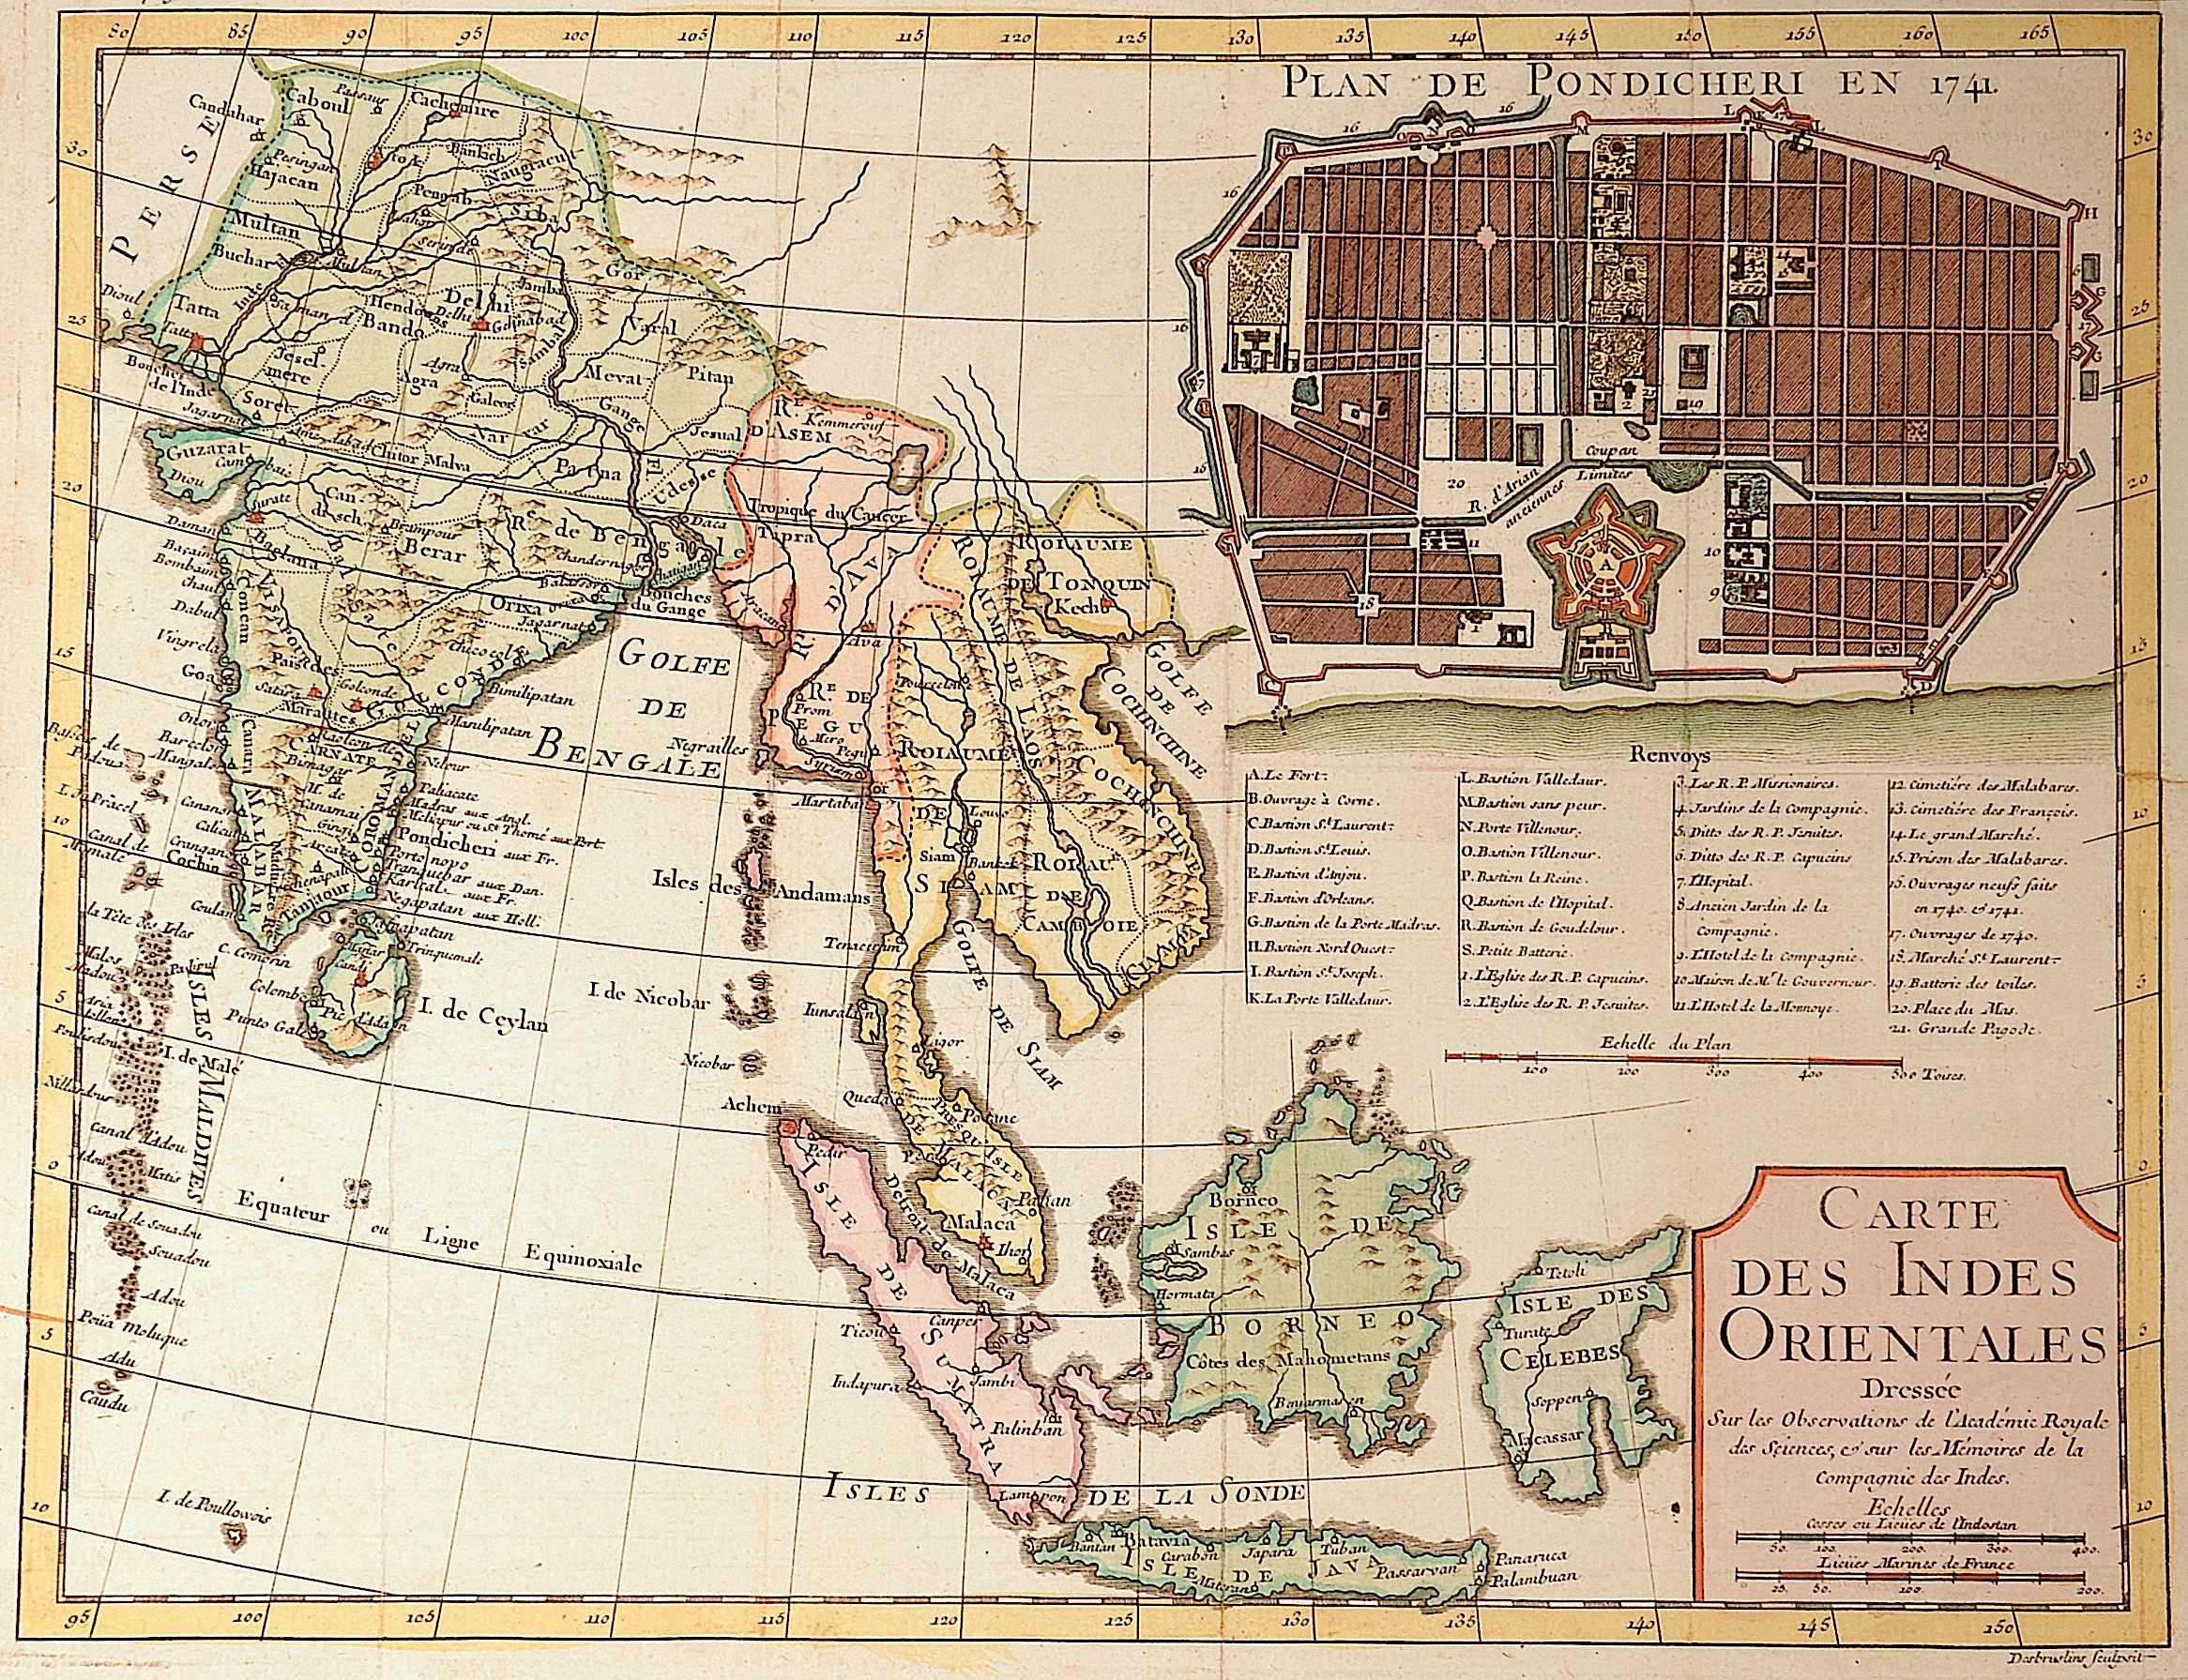 Tirion  Carte des Indes Orientales